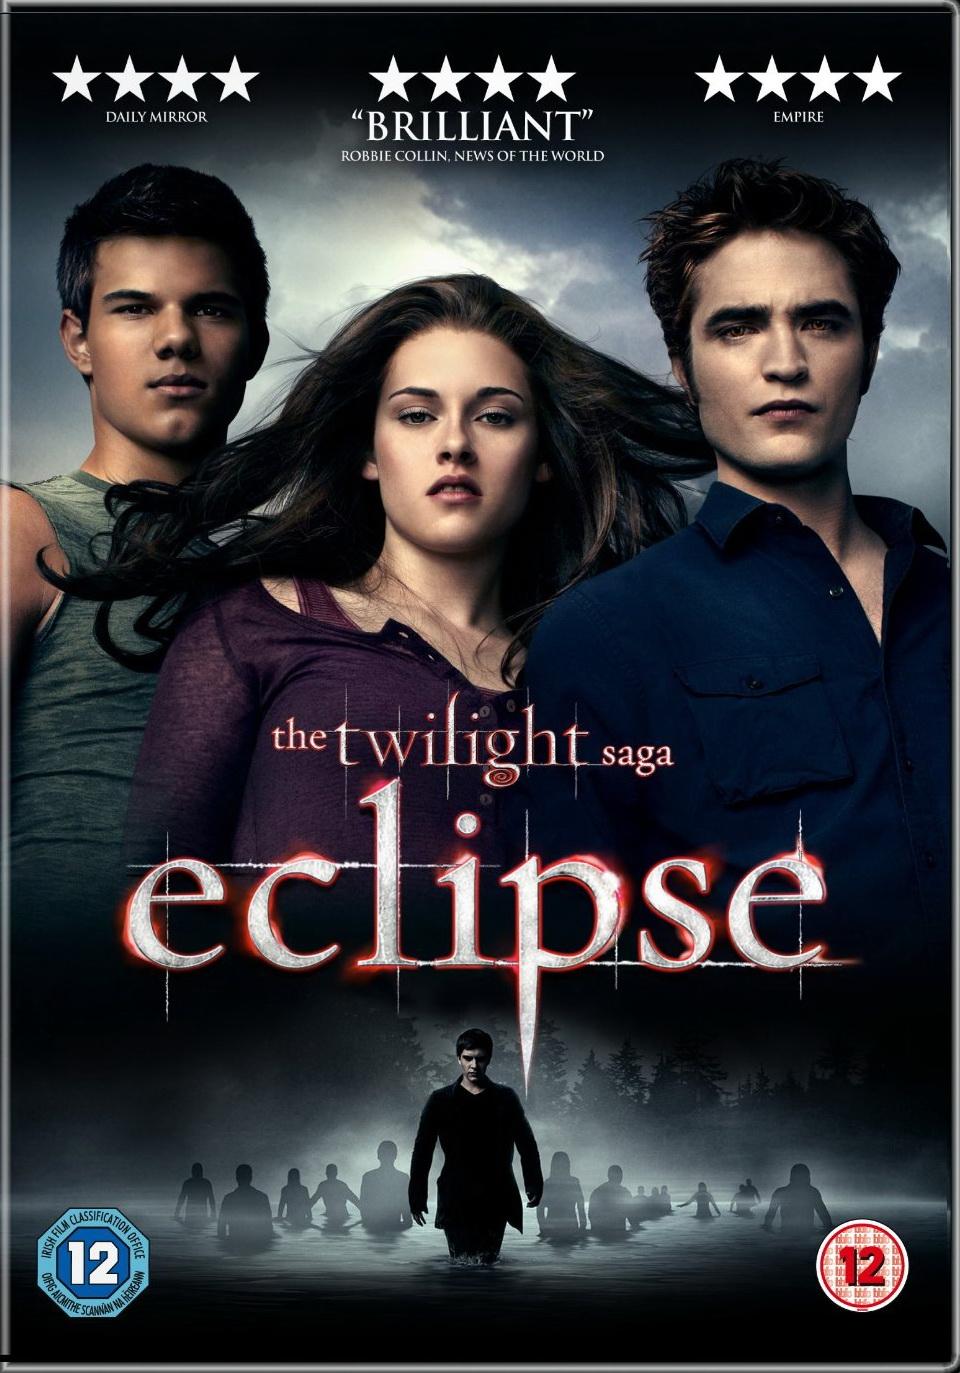 The real movie twilight